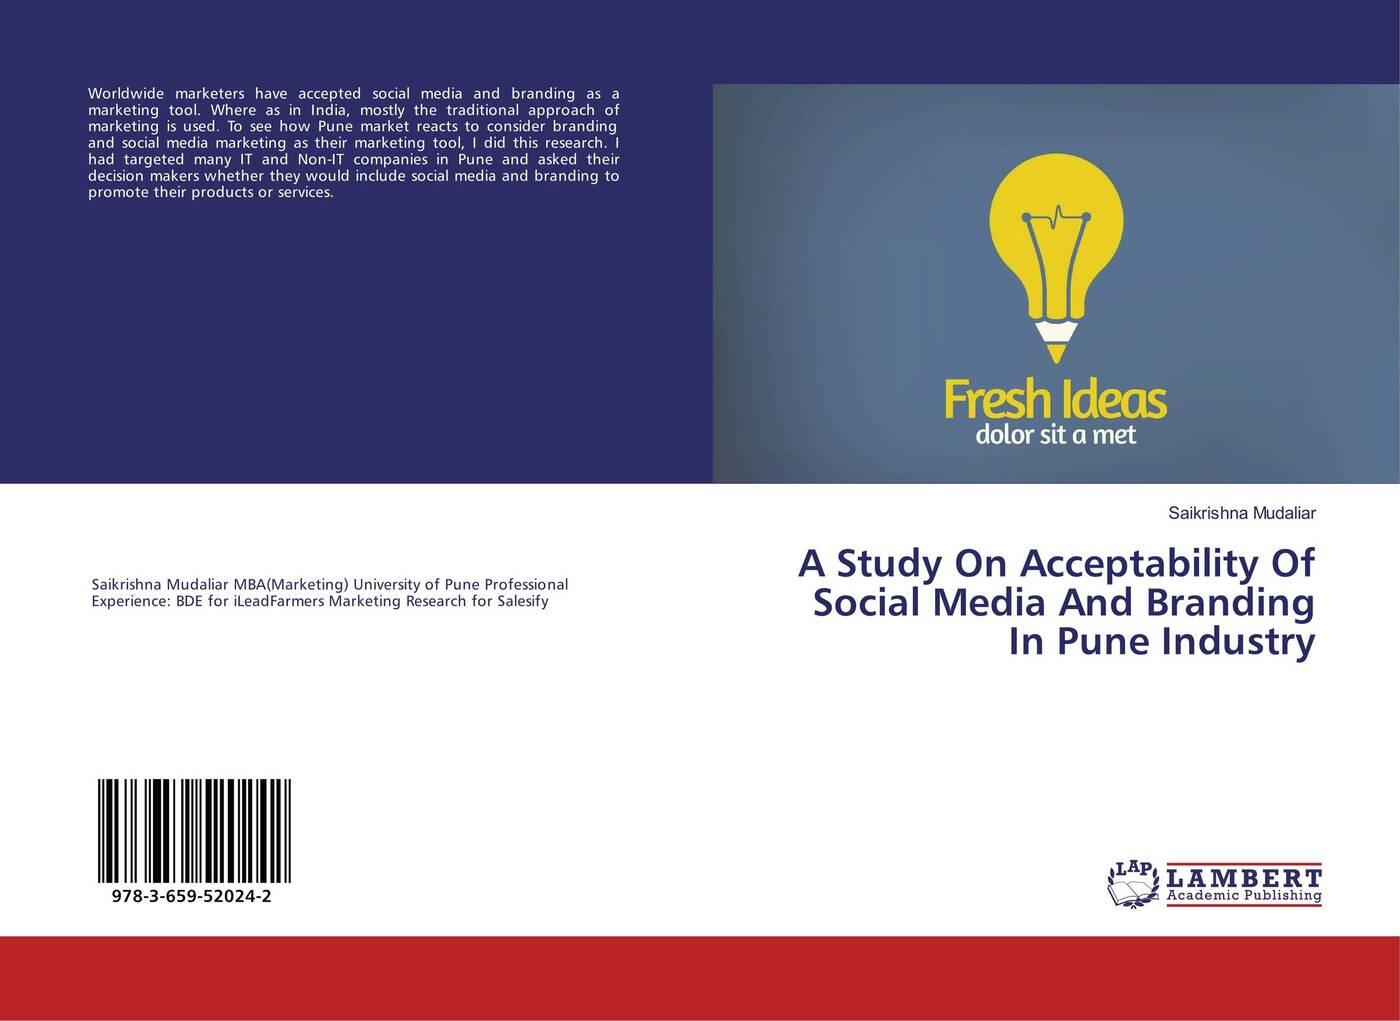 купить Saikrishna Mudaliar A Study On Acceptability Of Social Media And Branding In Pune Industry по цене 4358 рублей